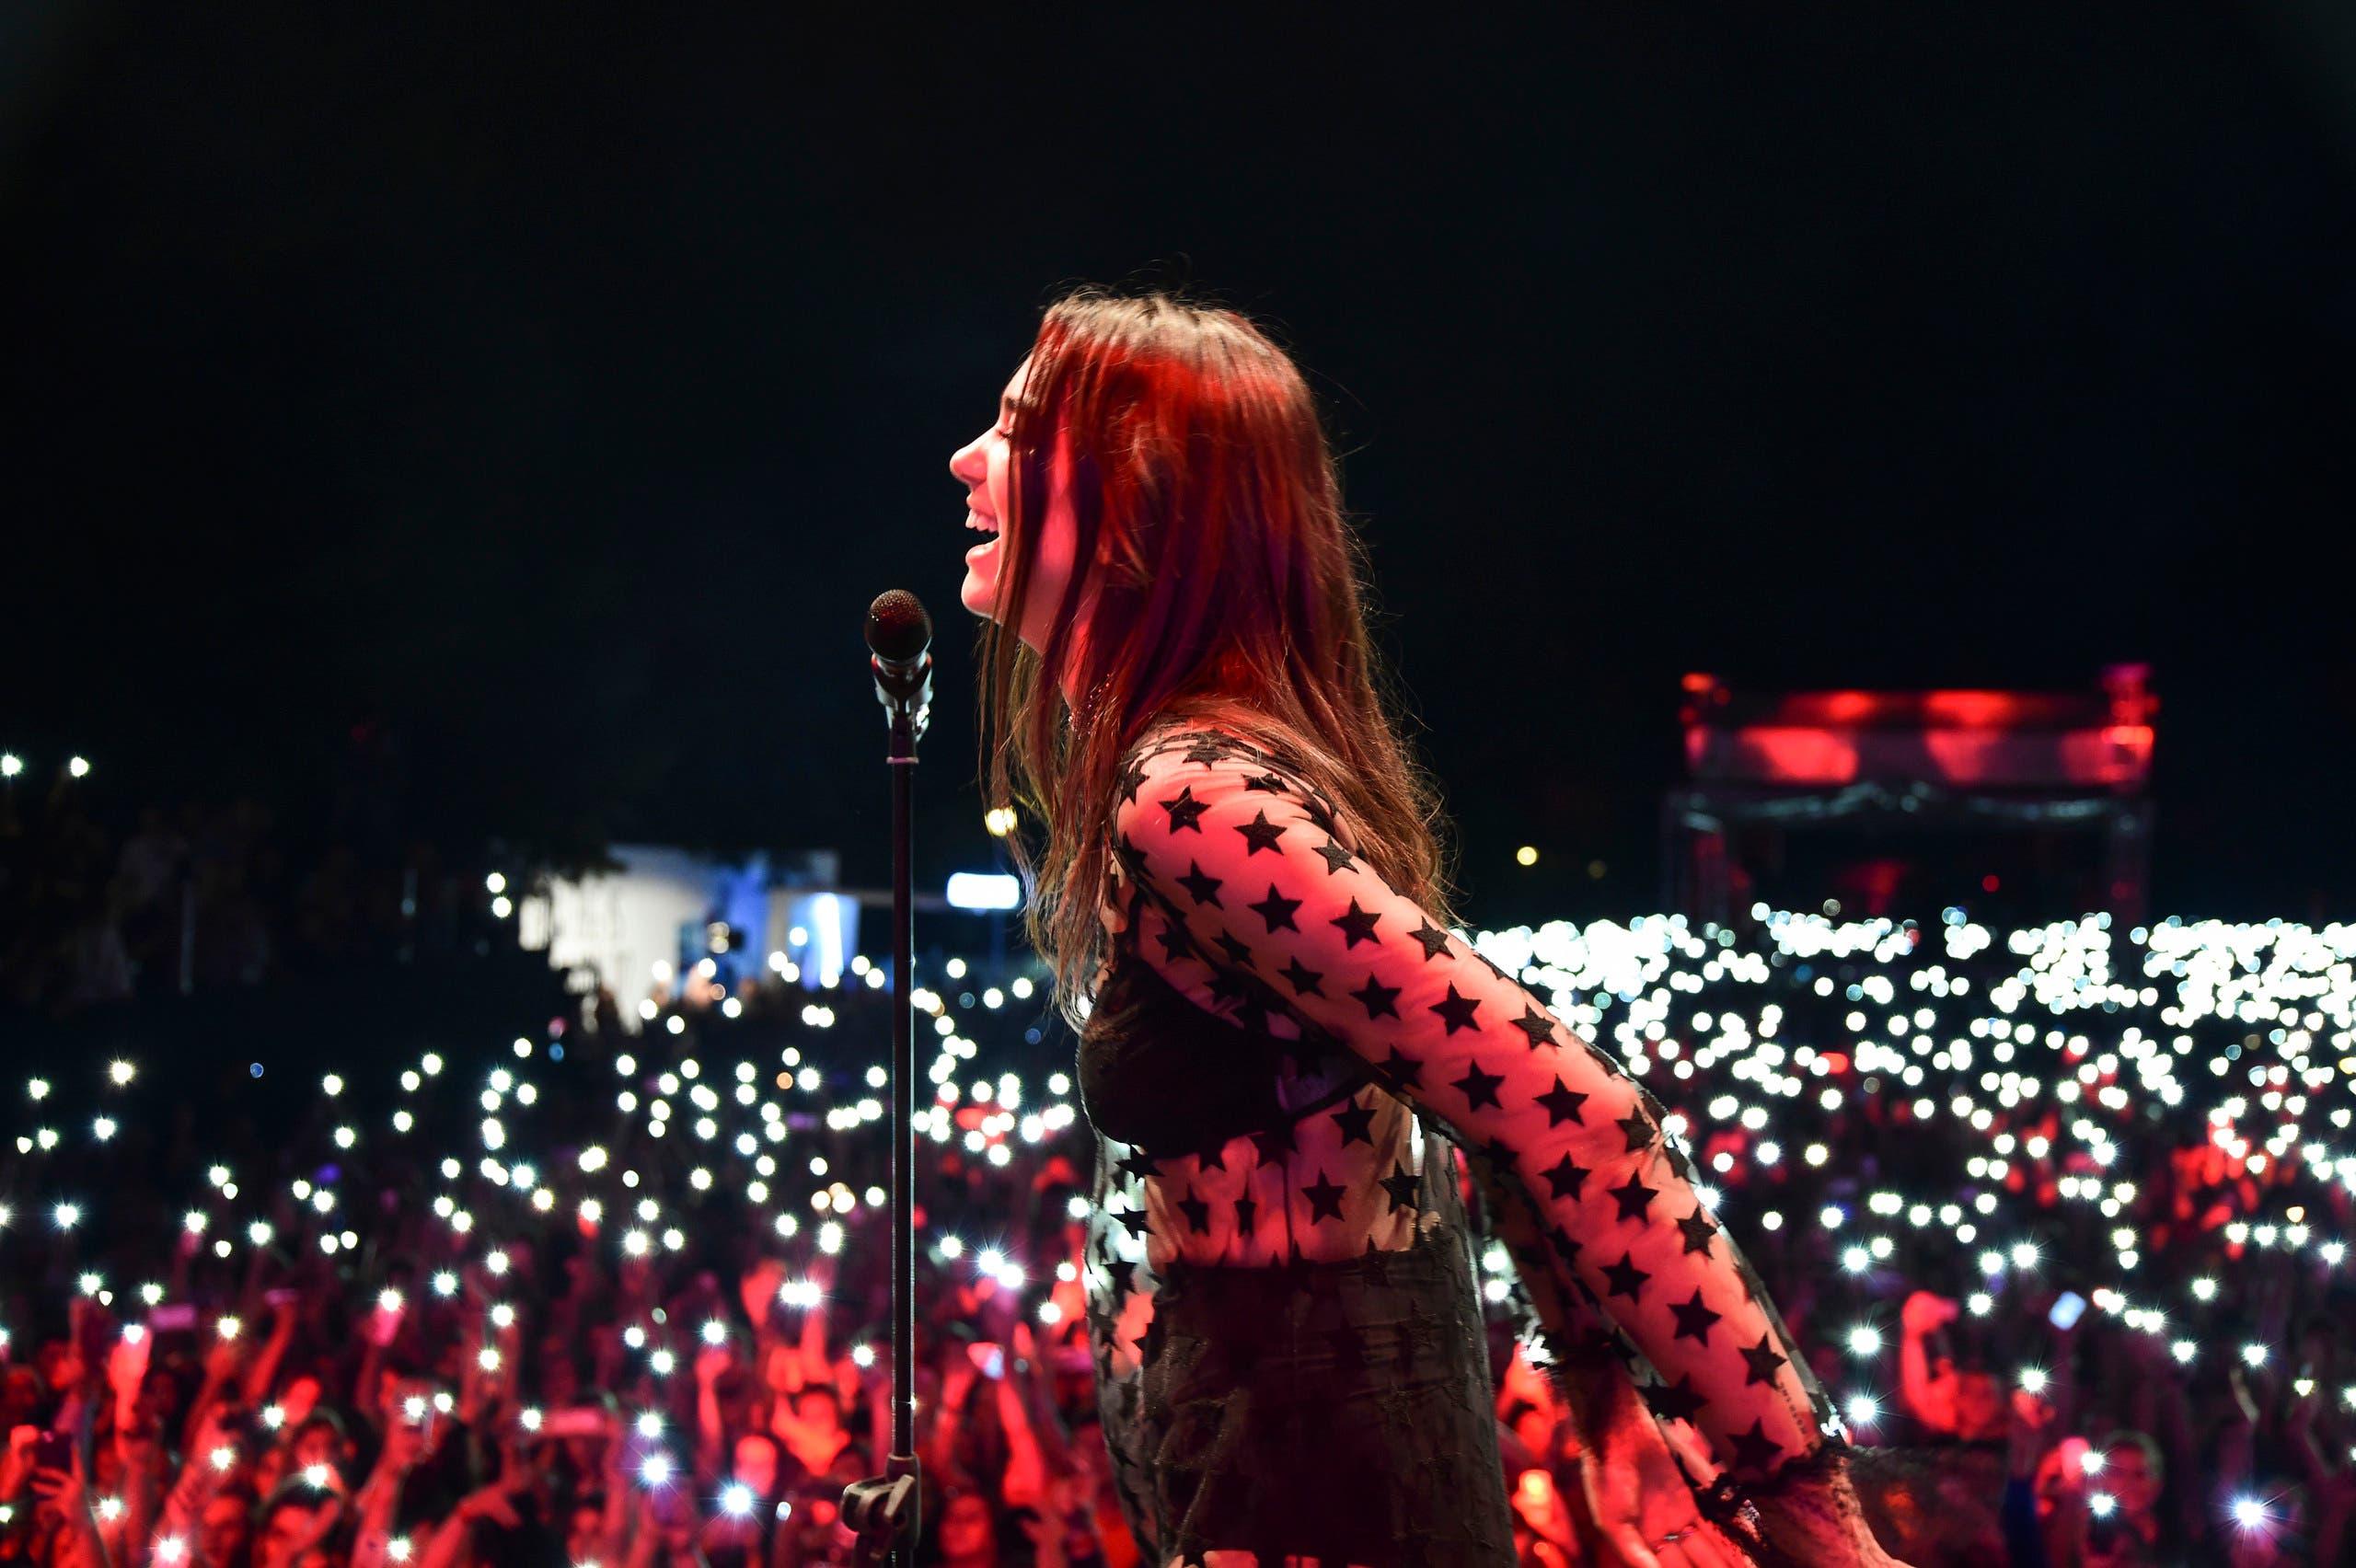 دوا ليبا تغني في حفل ببلدها كوسوفو